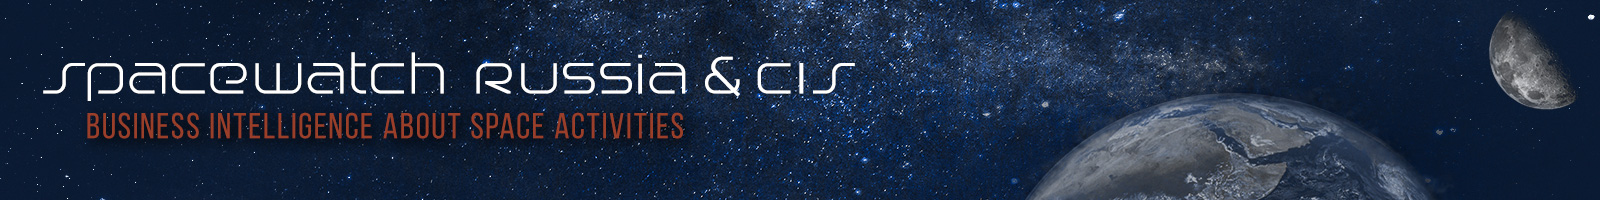 Russia&CIS